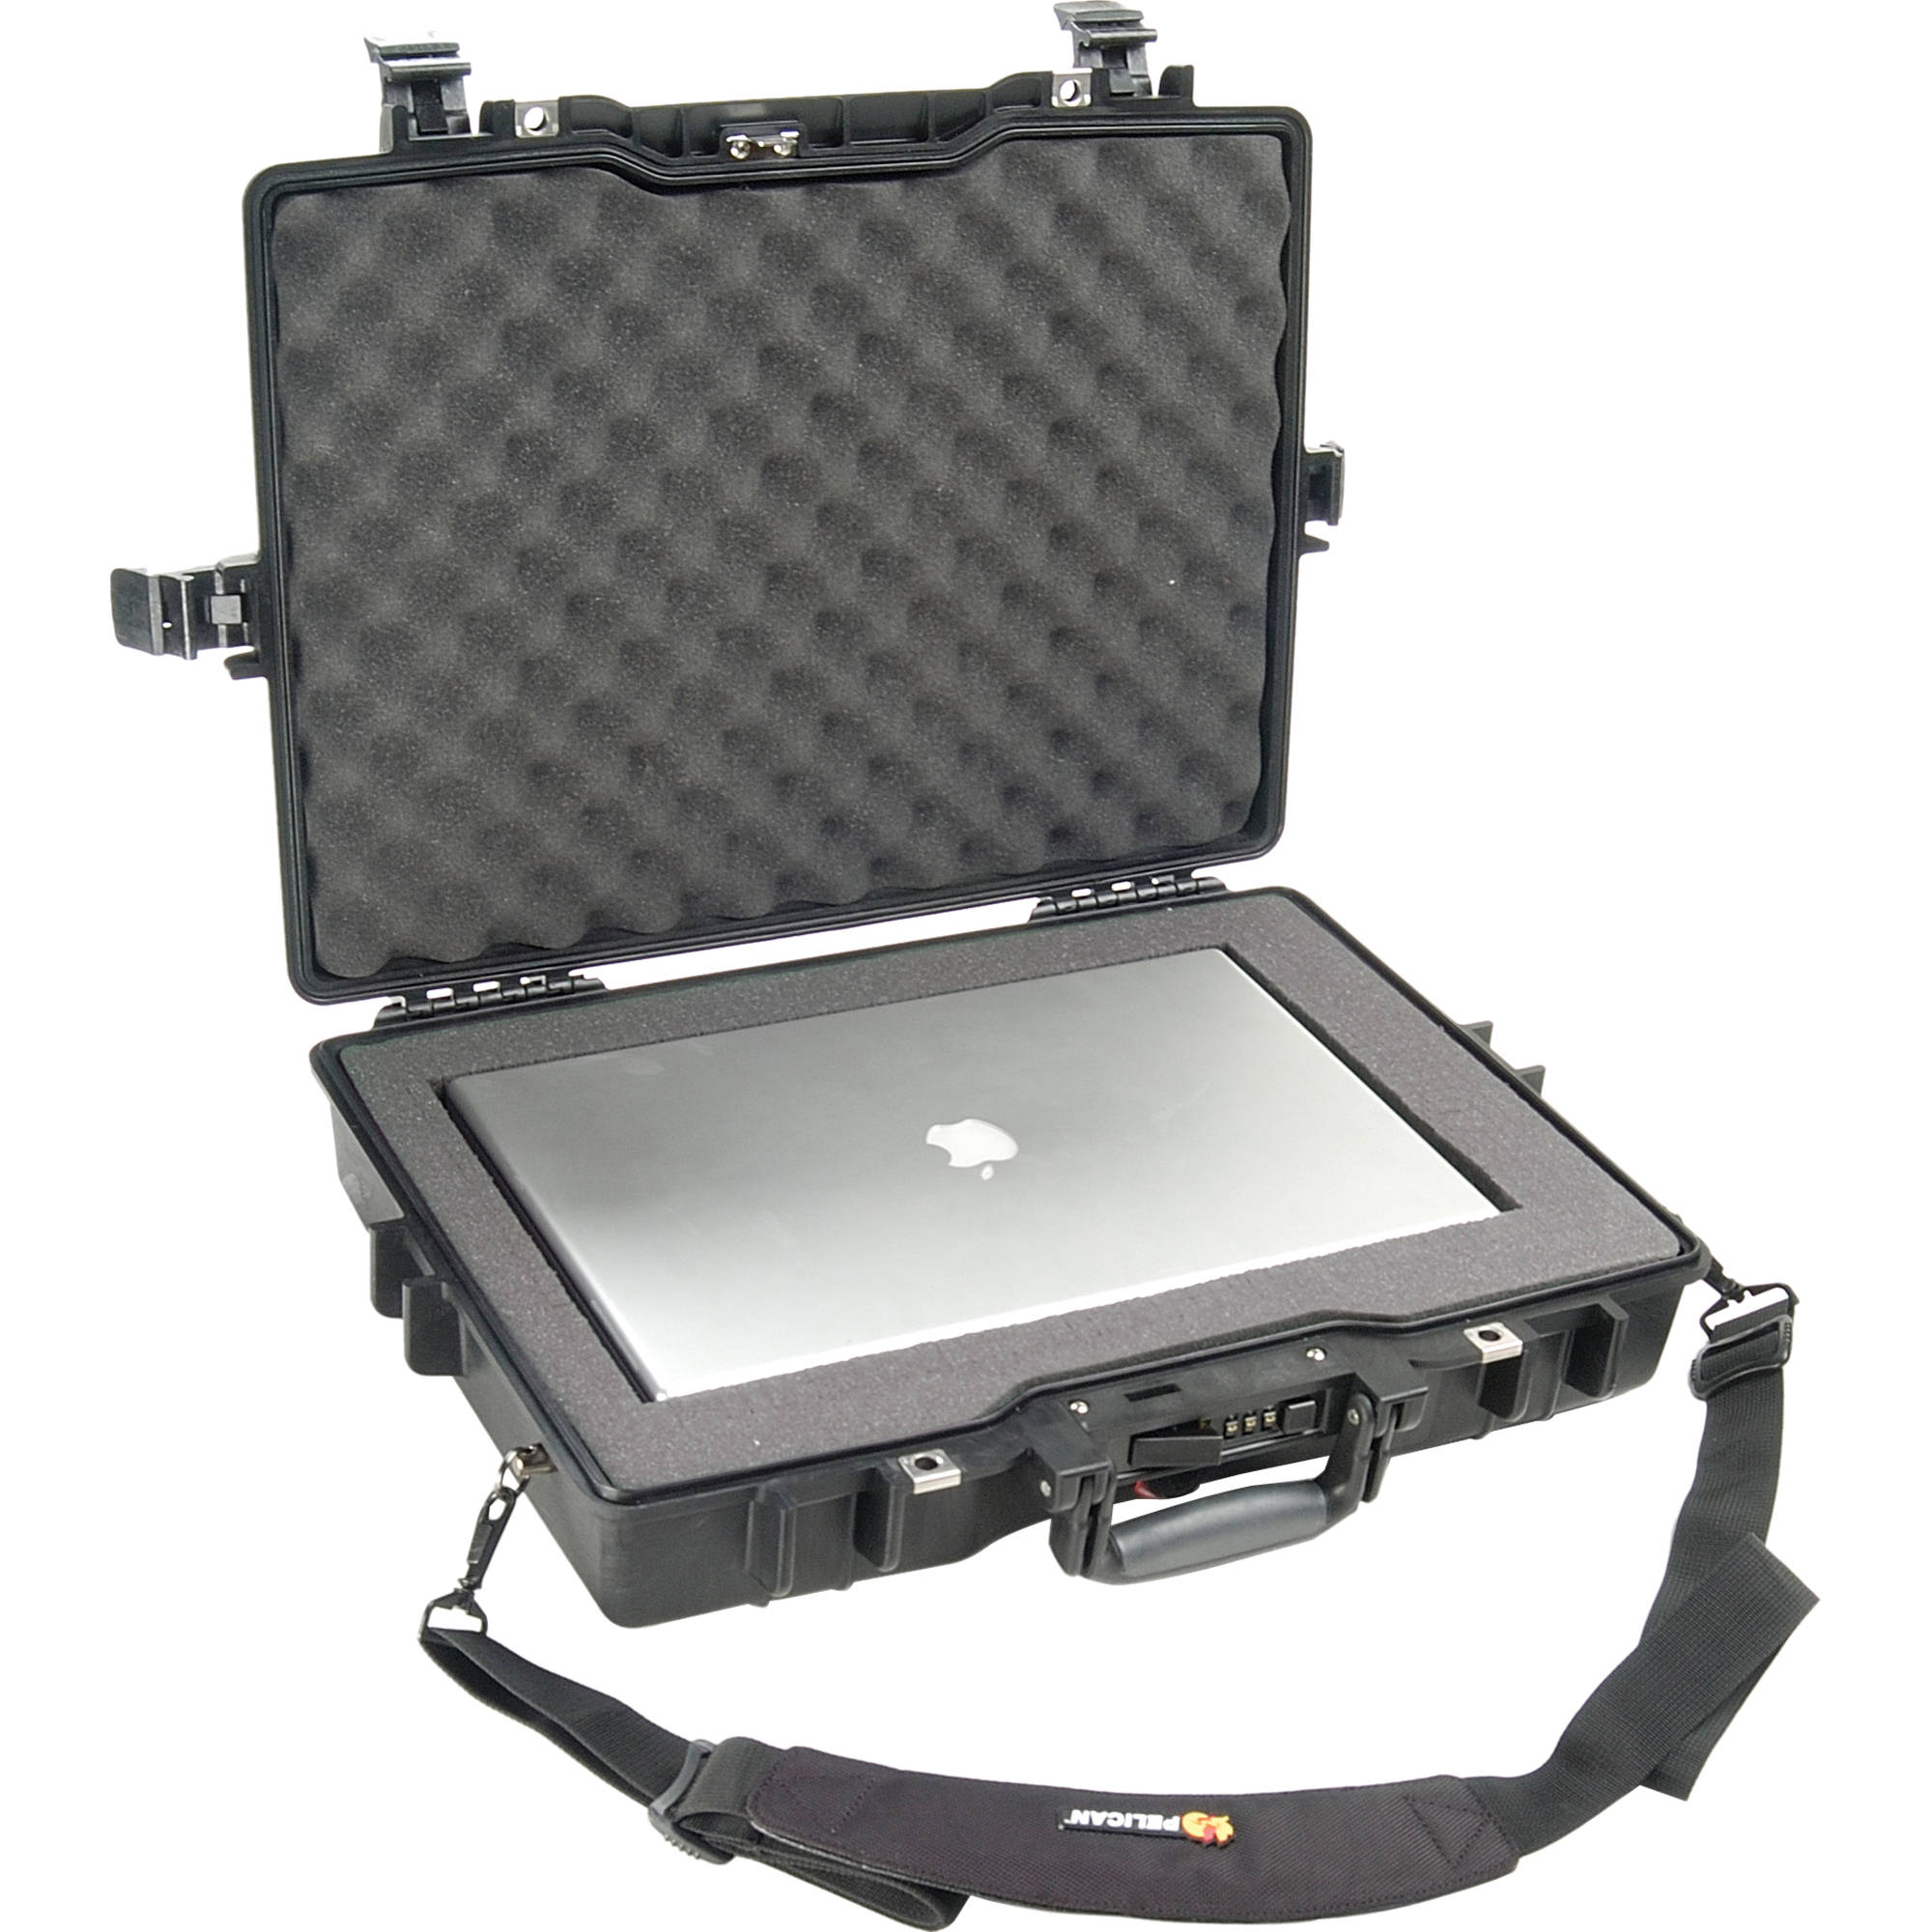 Pelican1495 Laptop Computer Case with Foam (Black) 4daebd55e